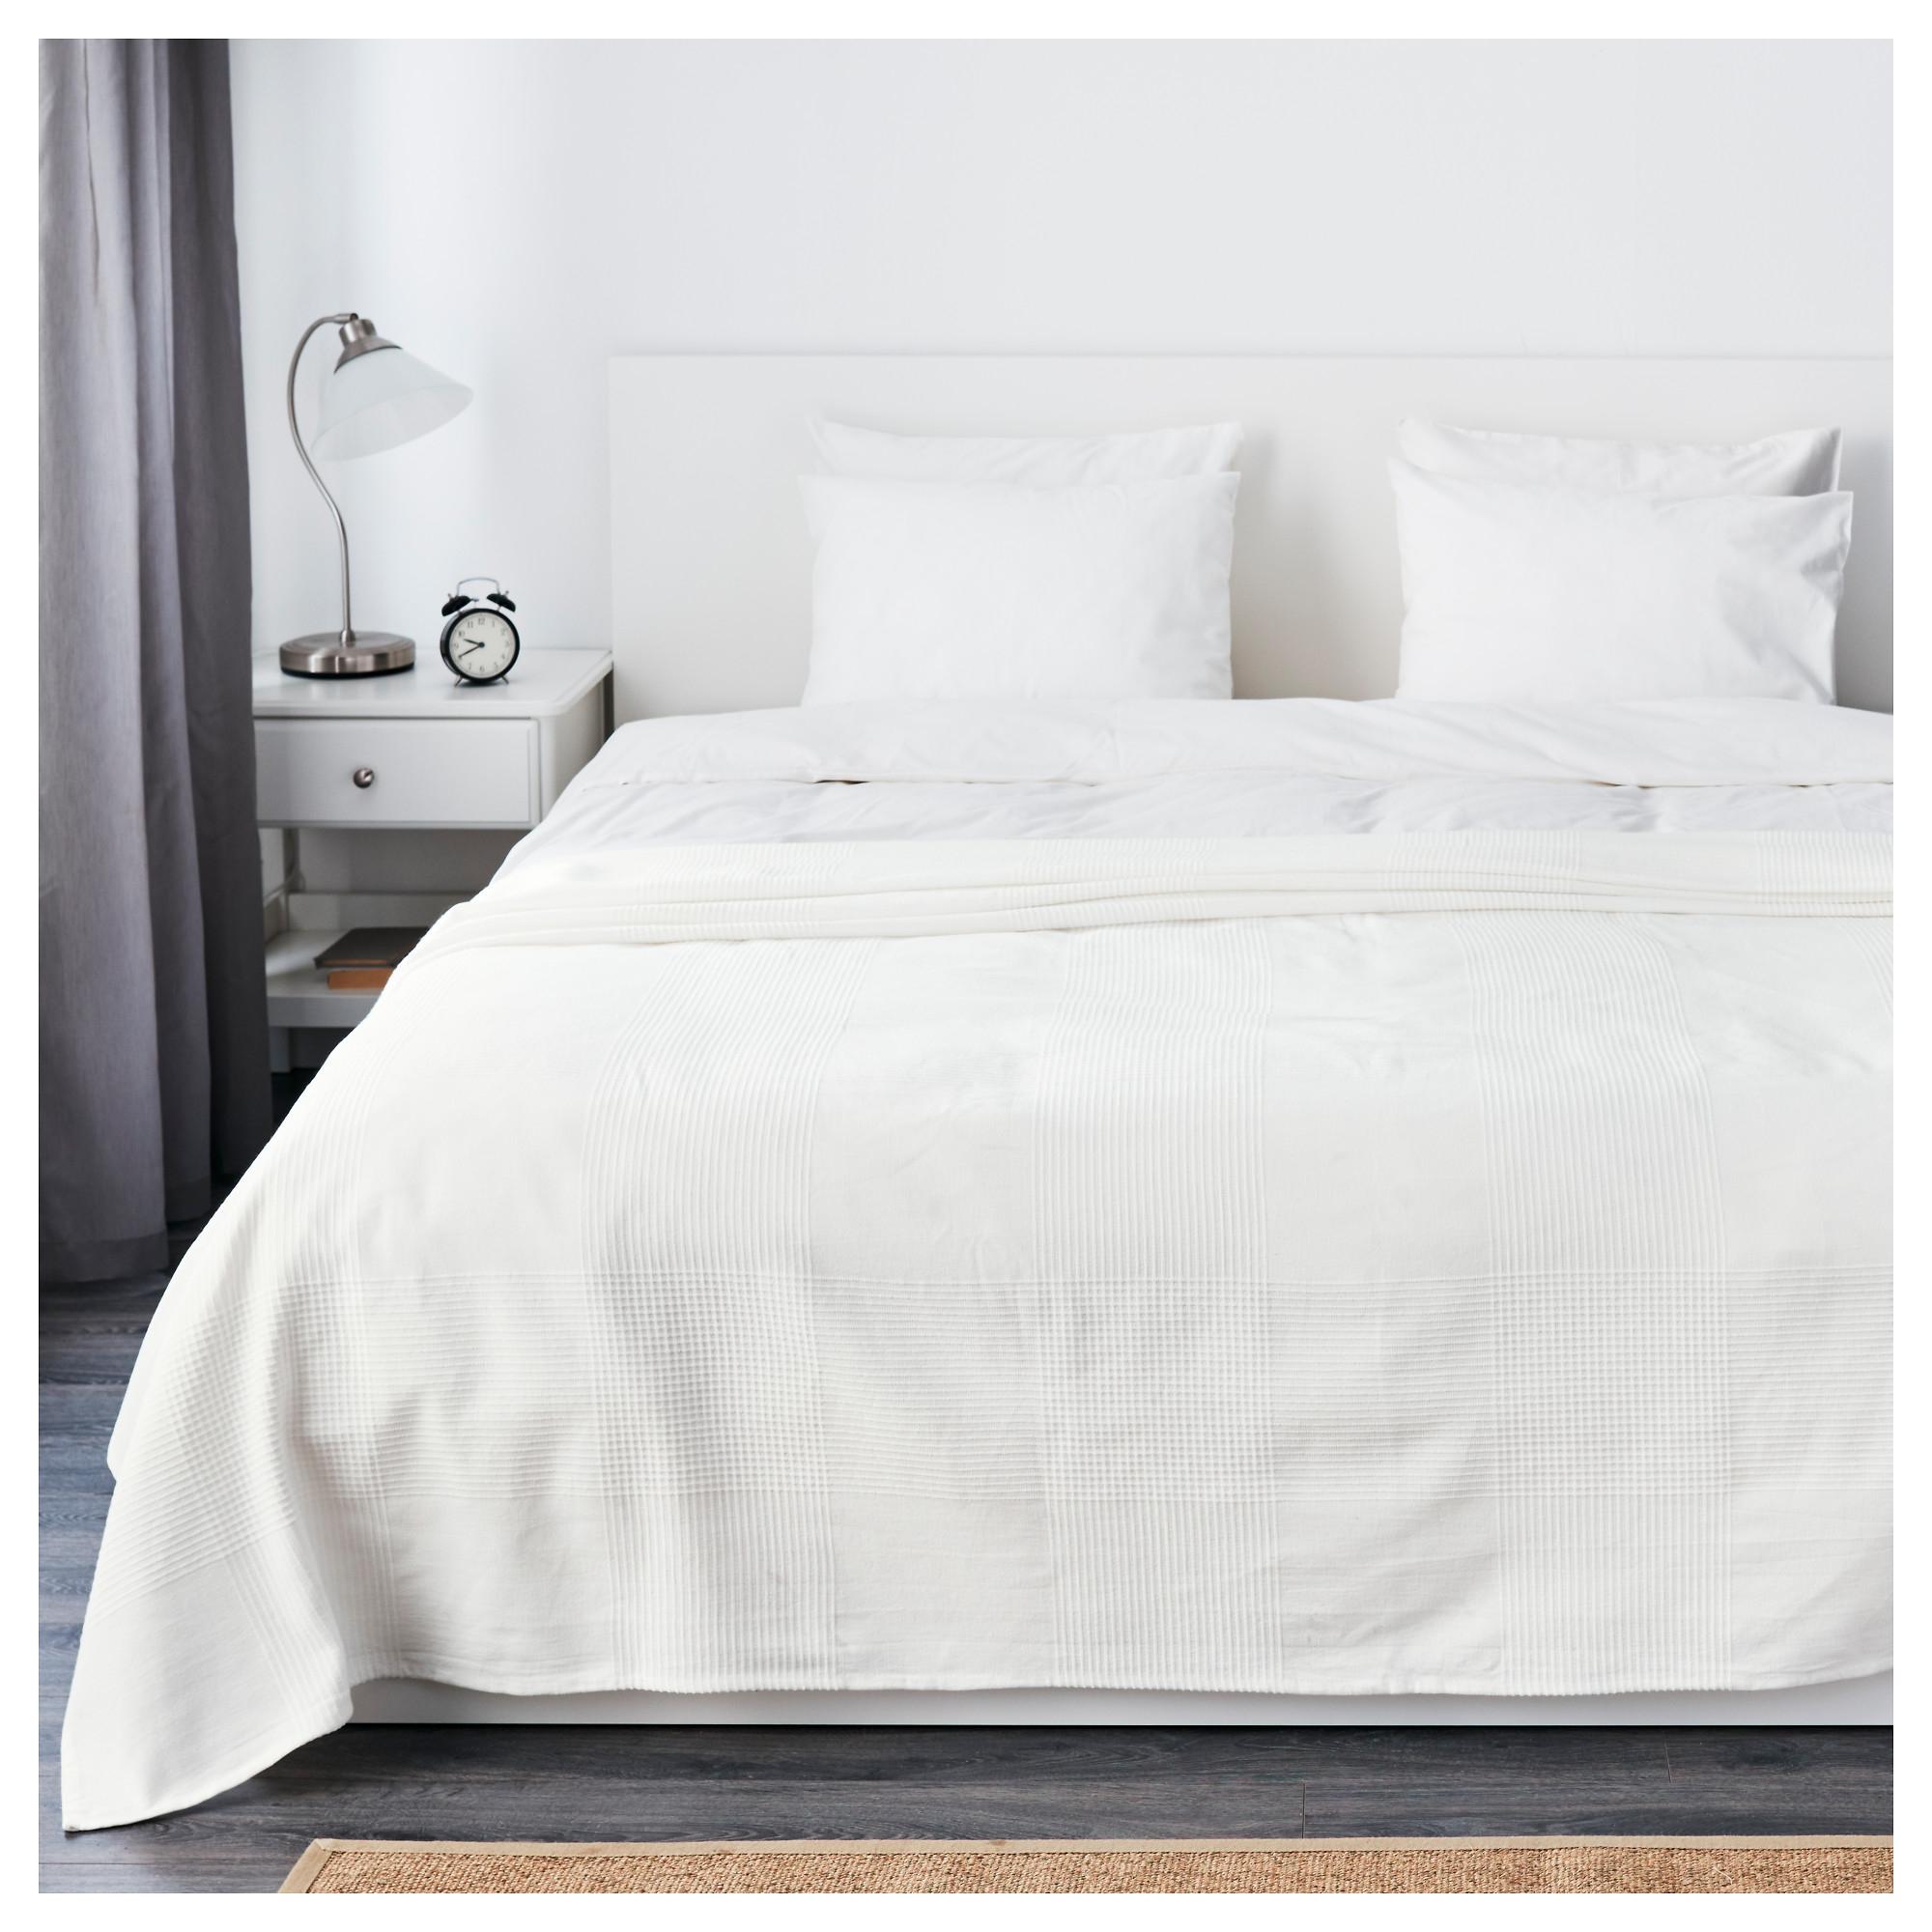 Indira colcha cama doble - Ikea ropa de cama colchas ...